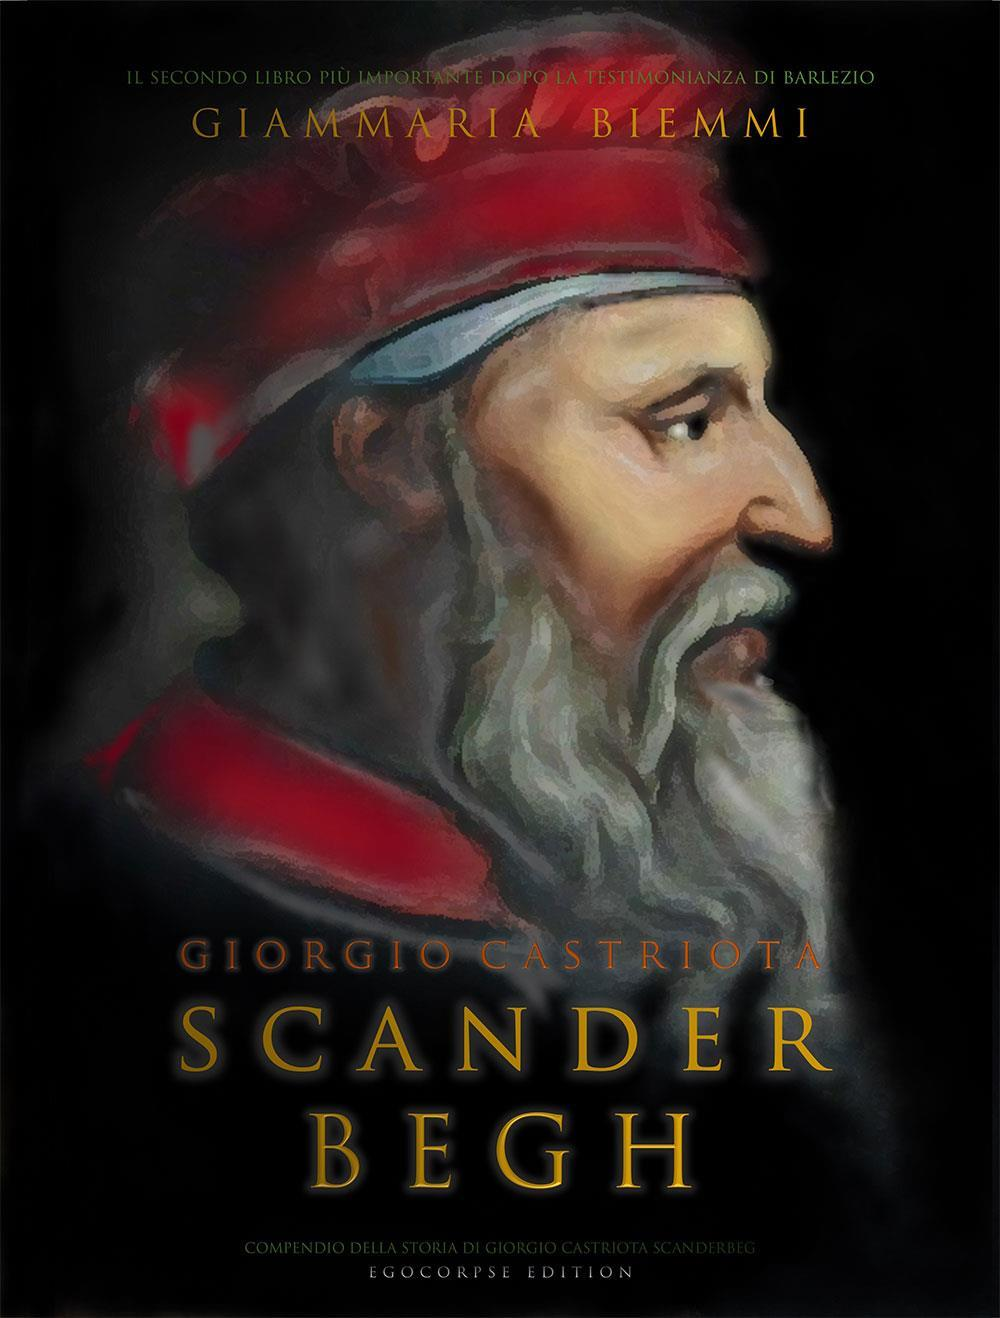 Scanderbegh